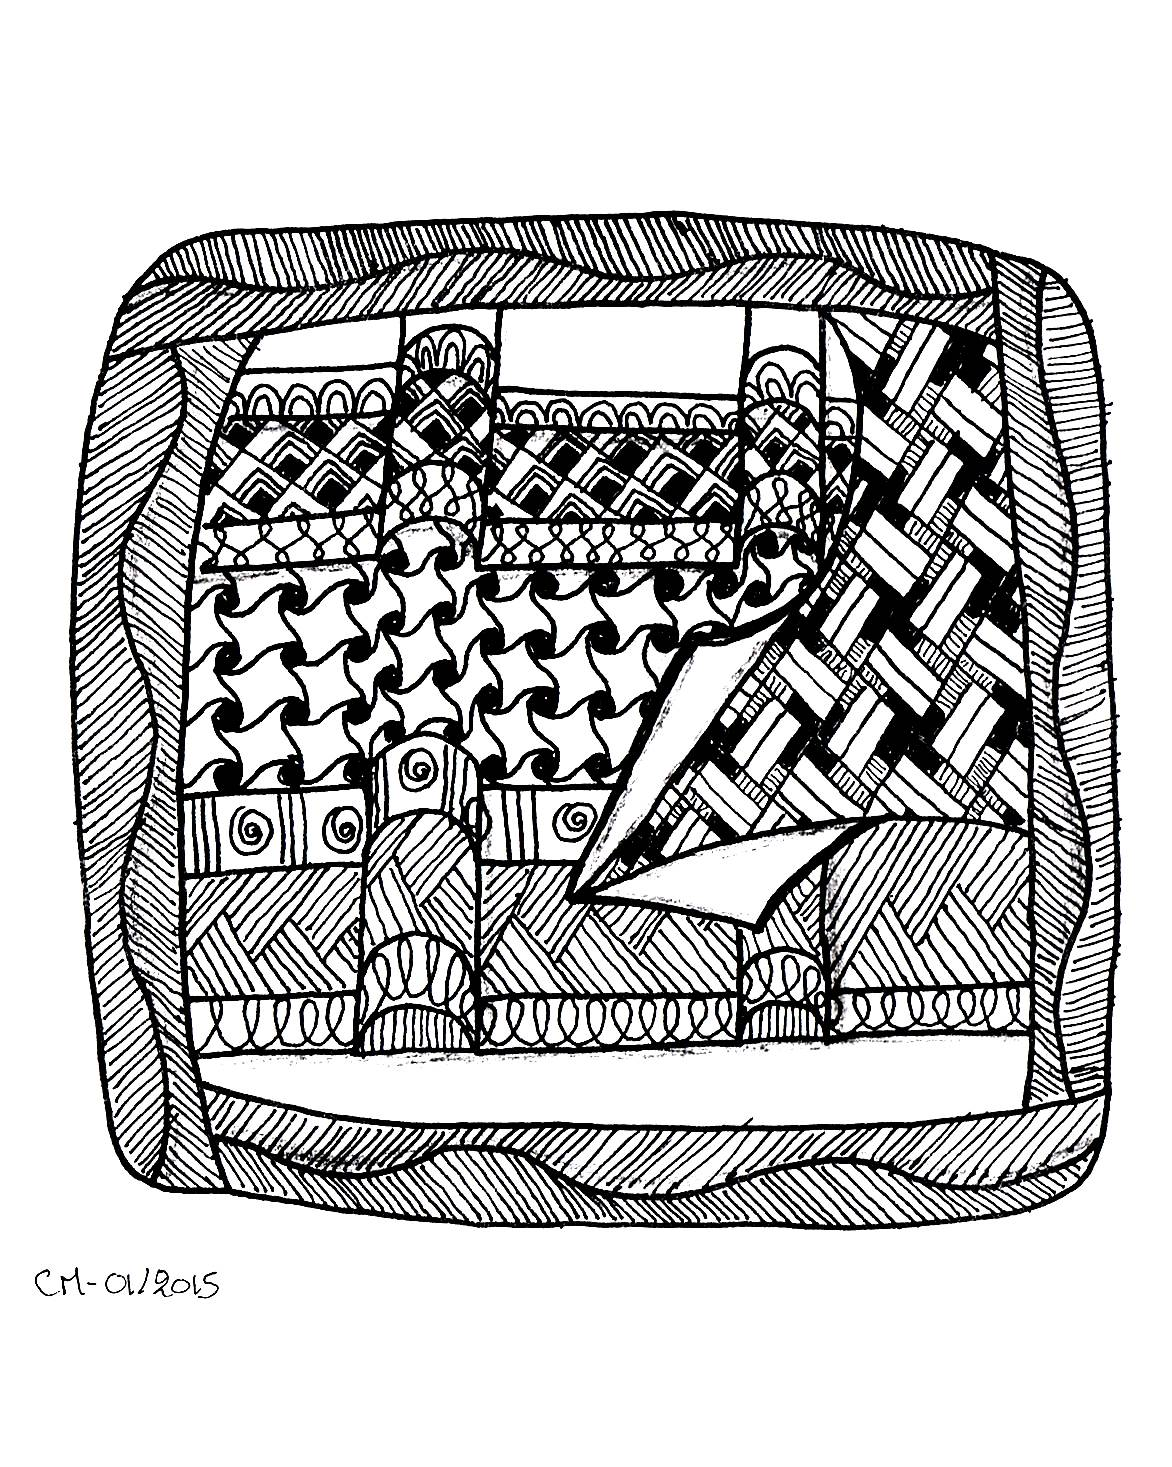 'Some tangles', coloriage original style Zentangle  Voir l'oeuvre originale